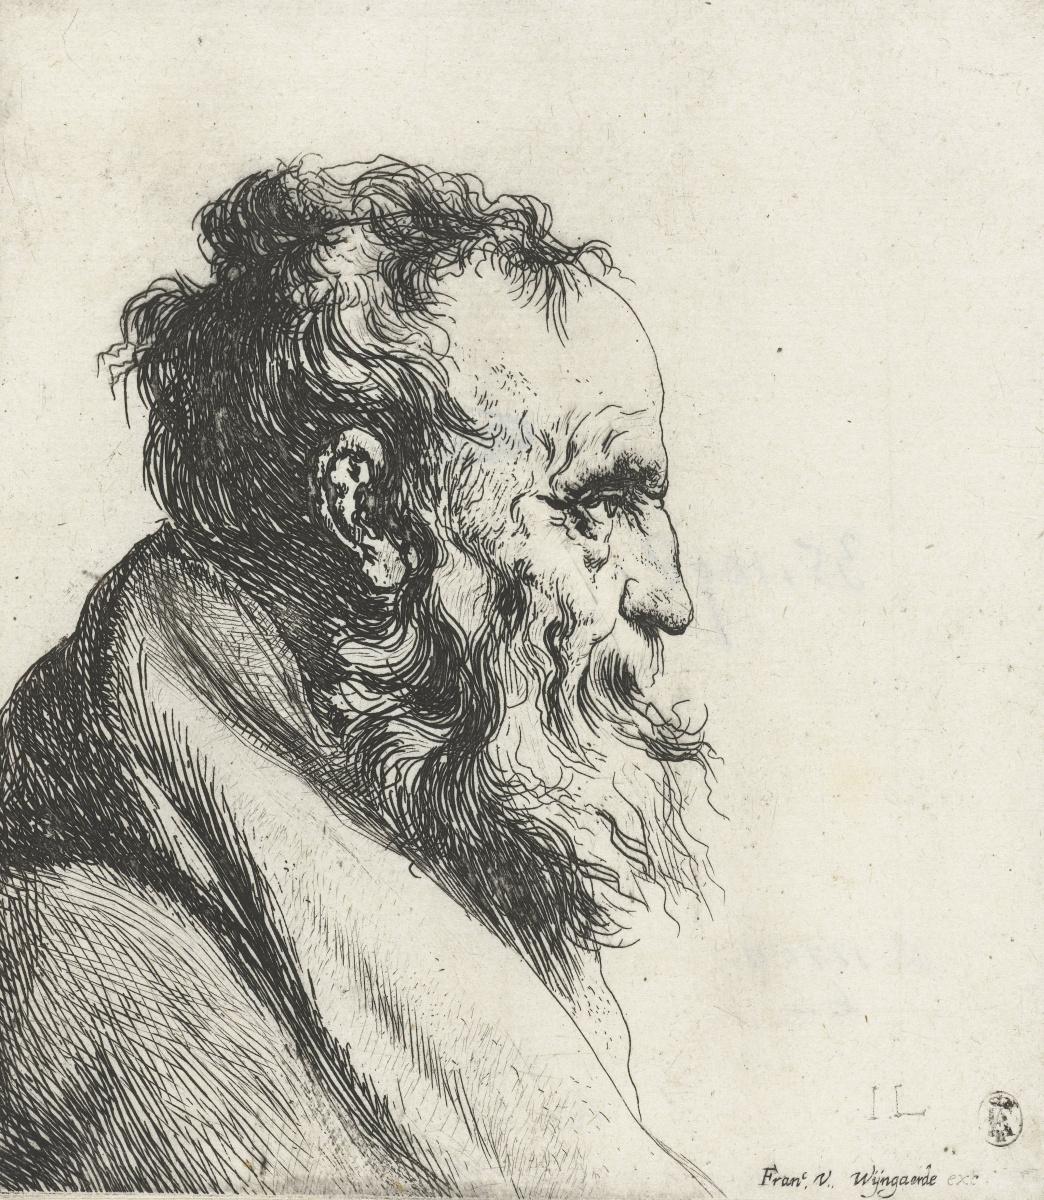 Jan Lievens. Profile of an elderly man with a beard